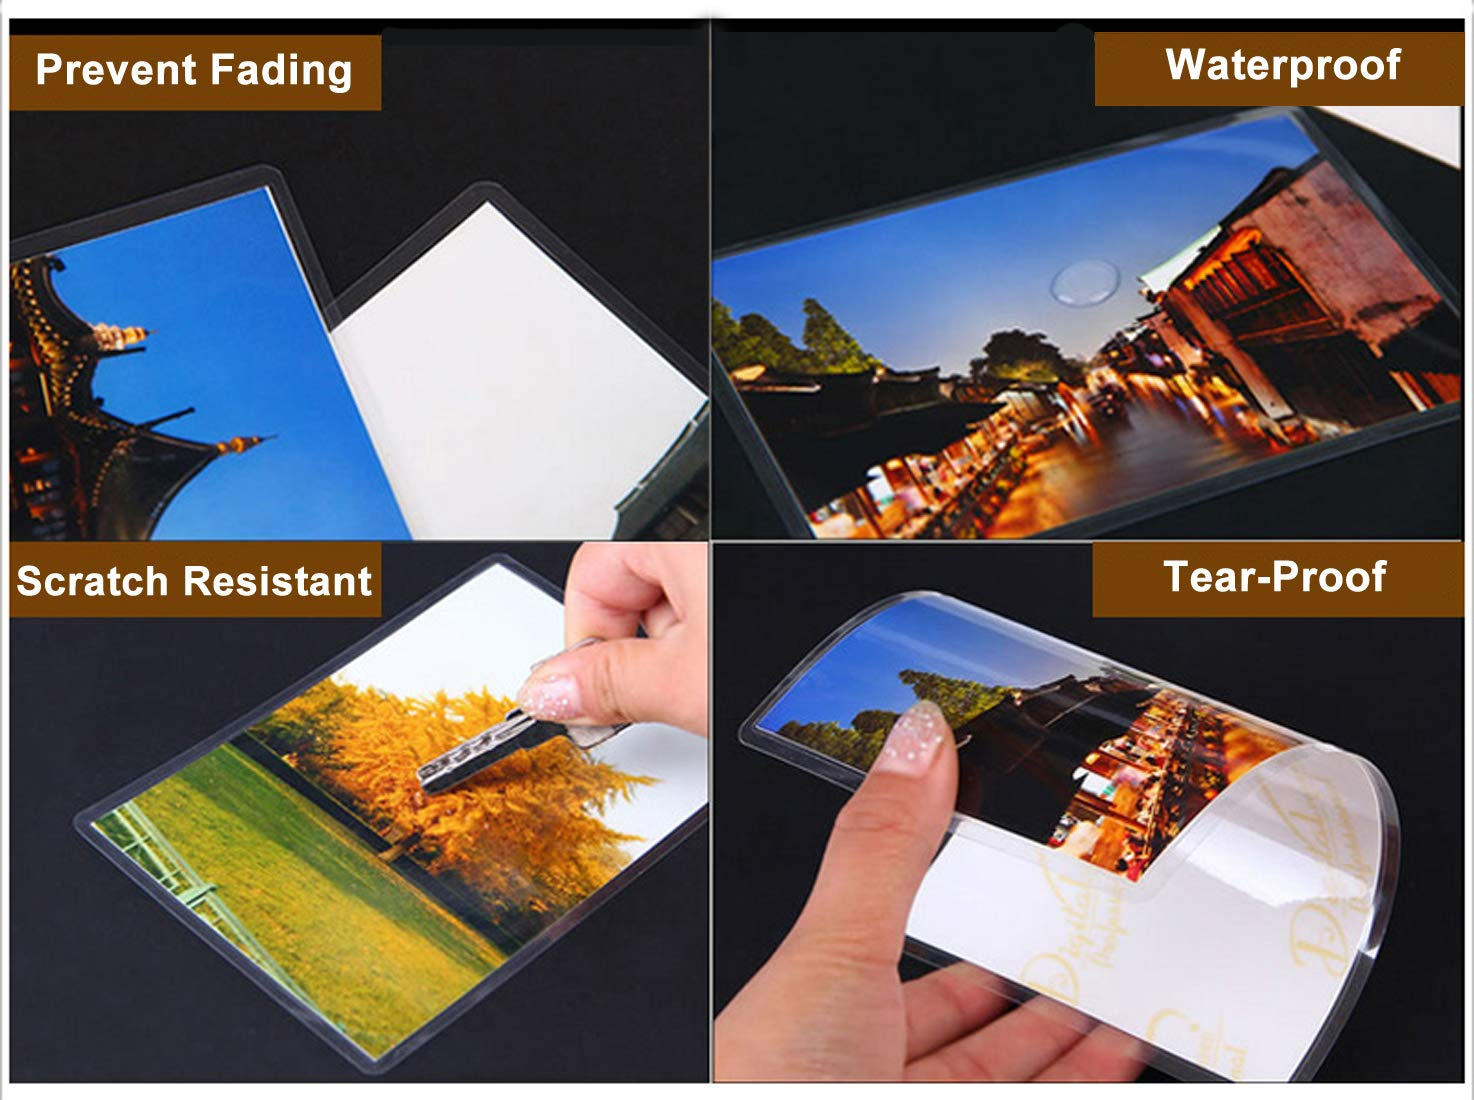 Dimensione 11x16cm Puches Plastificazione Confezione da 100 2x75mic Plastificare Fogli per Plastificatrice a Caldo per Foto Carta Sigillata Halcent 10x15cm Pouches per Plastificatrice